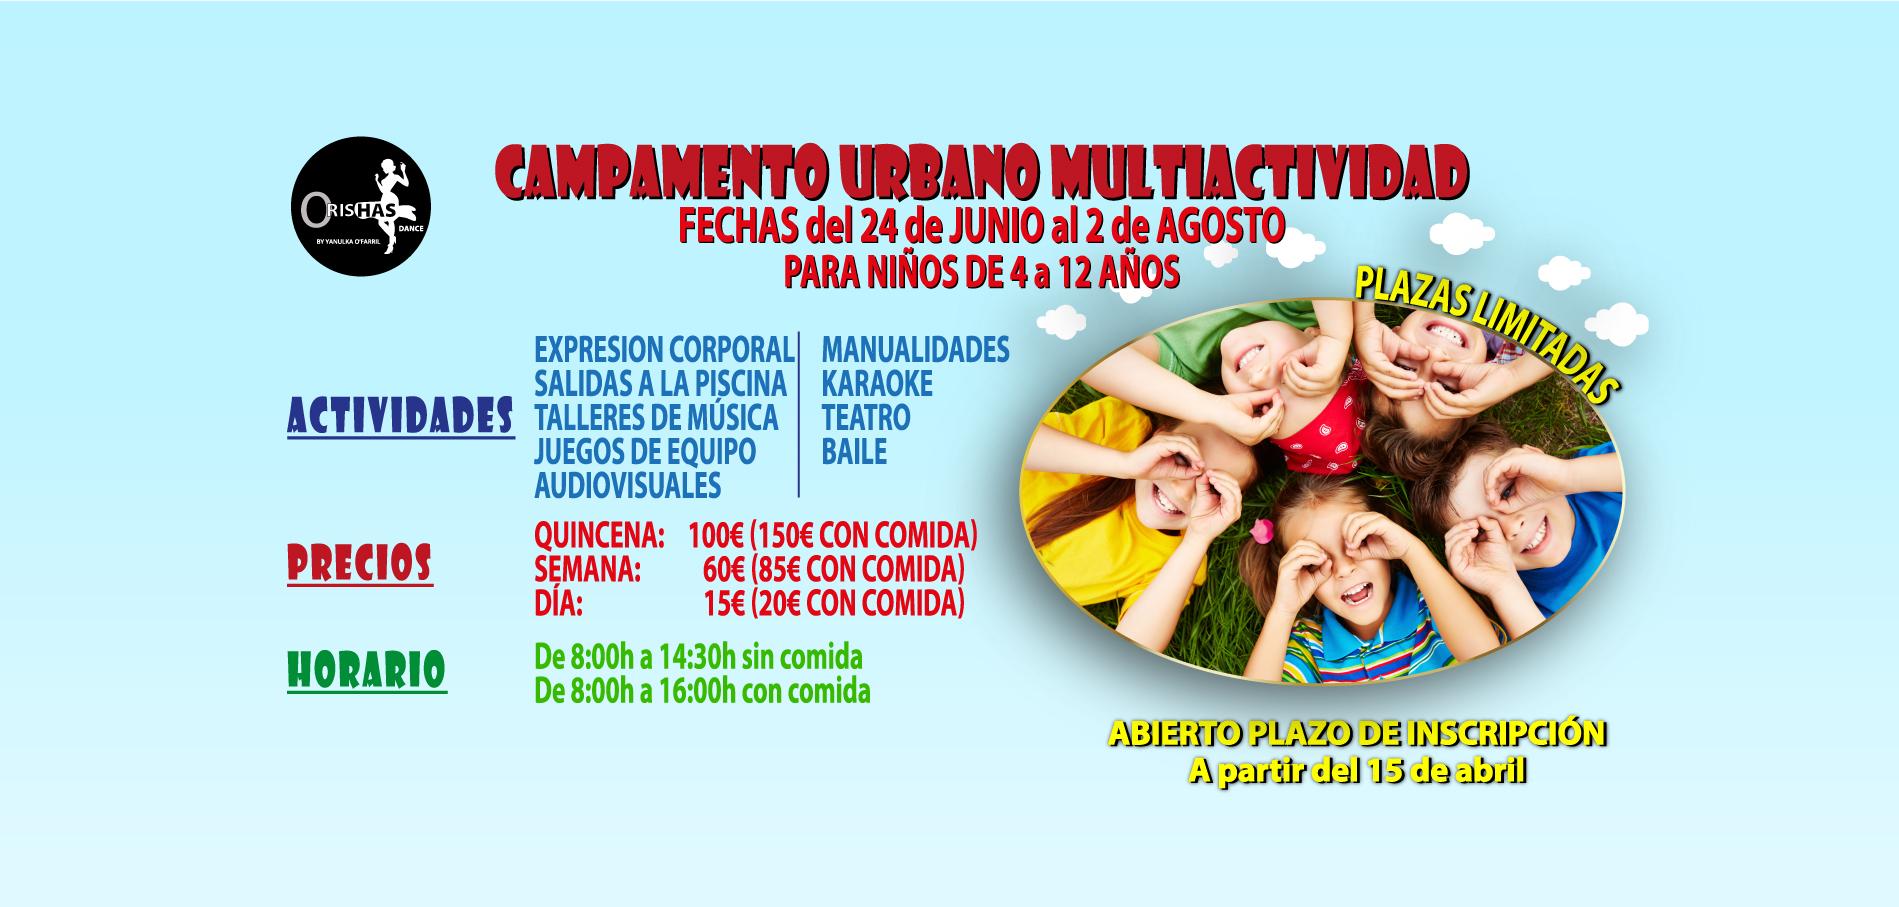 CARTELES-CAMPAMENTO-URBANO-ORISHAS-DANCE-WEB